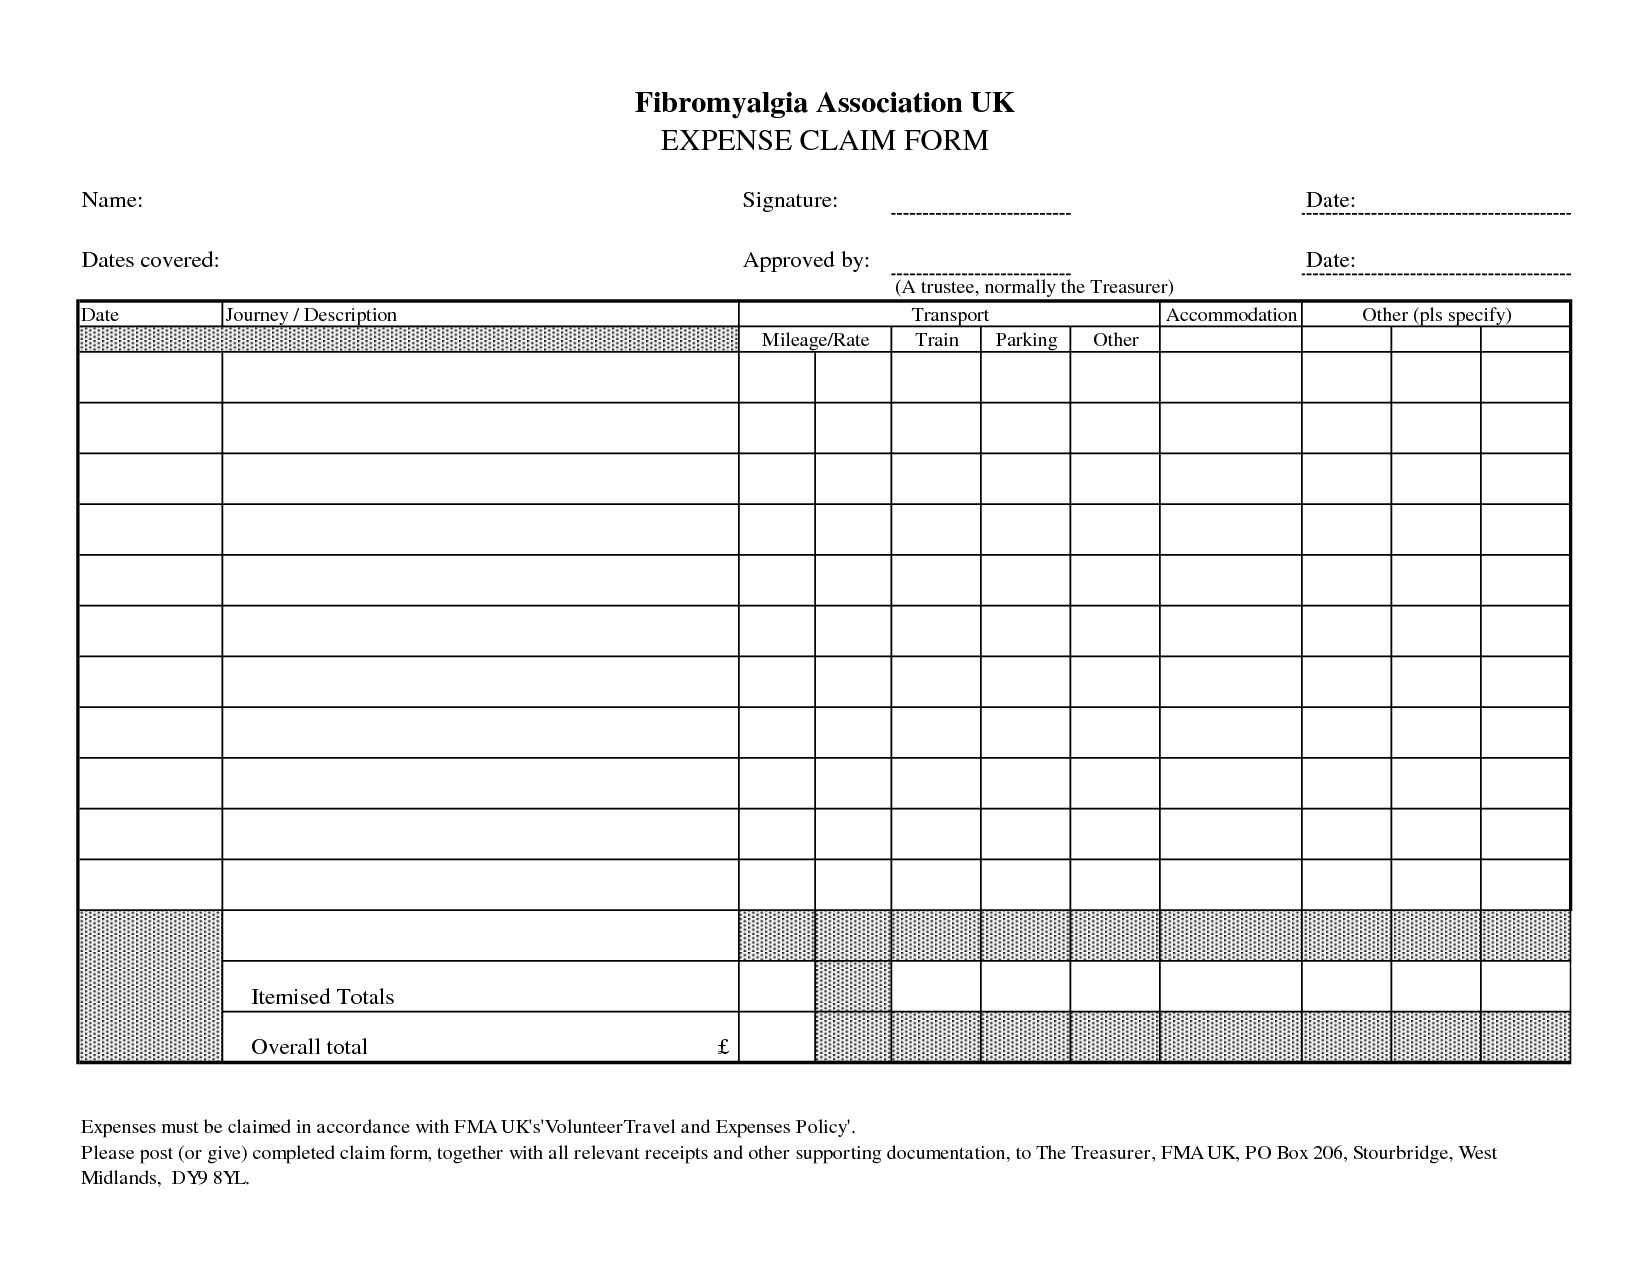 Mcgill Expense Report Per Diem And Per Diem Request Form Template Pertaining To Per Diem Expense Report Template